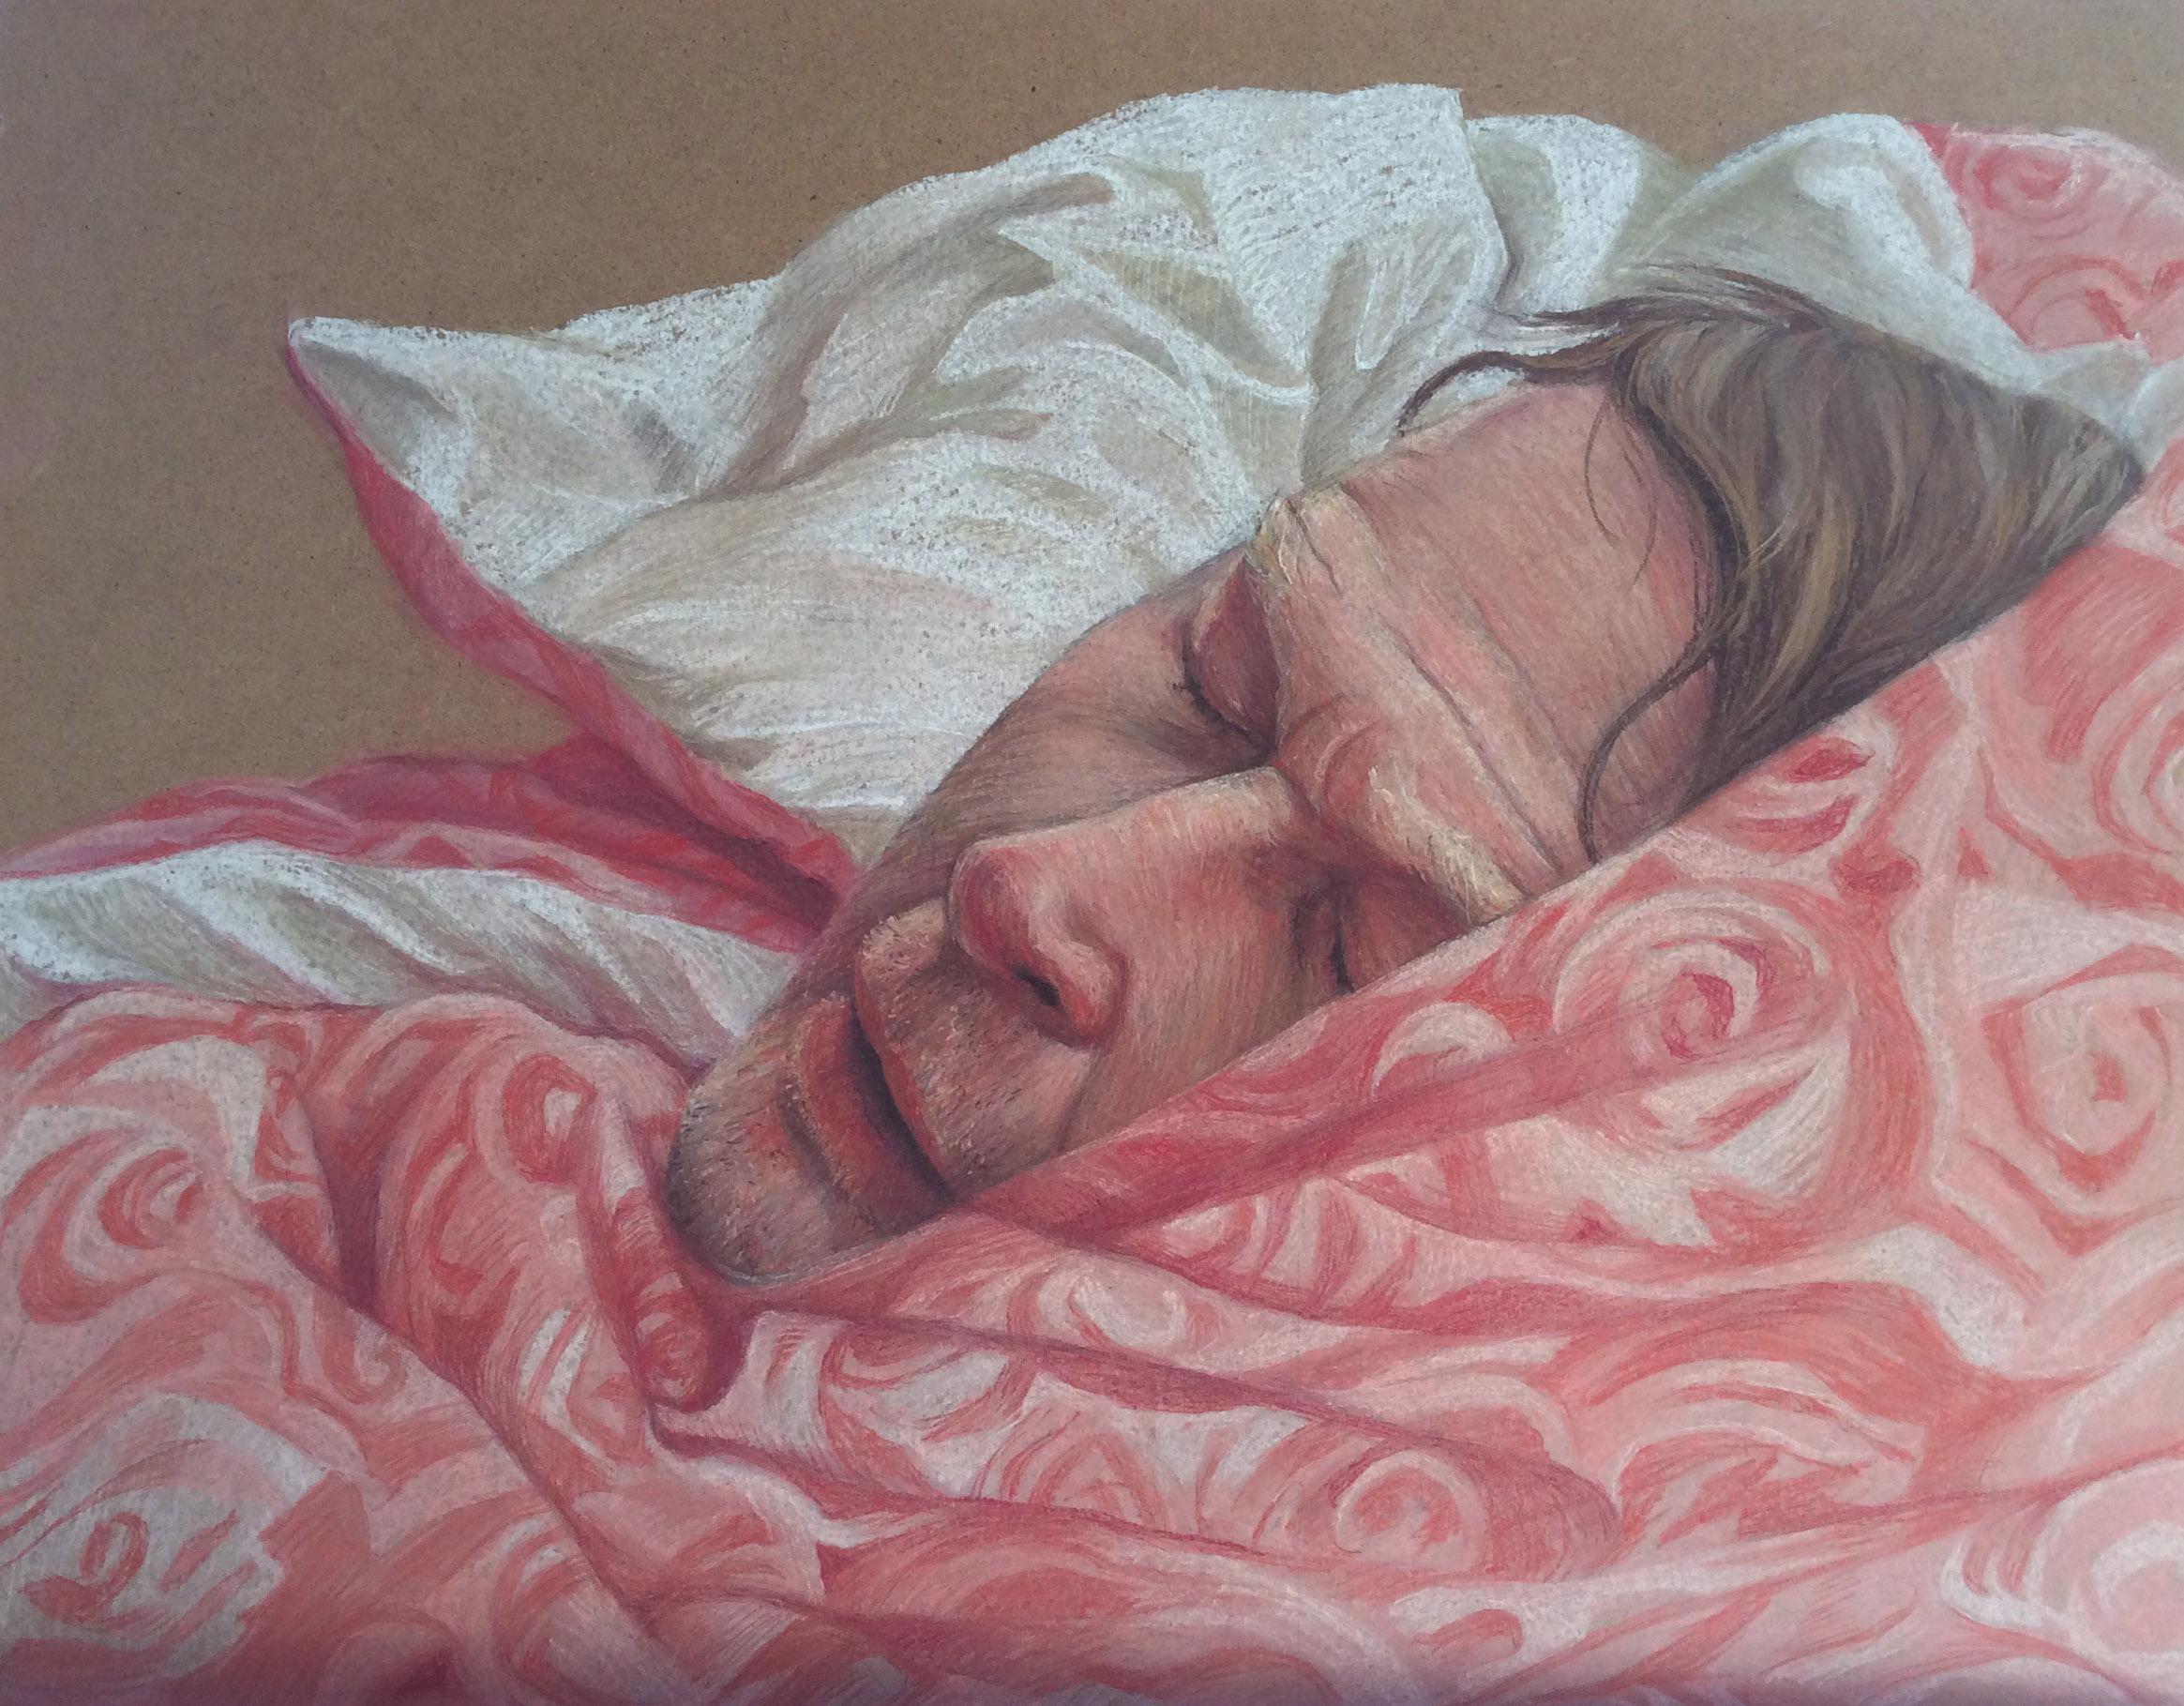 Merlyn Harvey, After Nightshift, Rembrandt soft pastels on board, height 40 cm x width 50 cm x depth 0.3cm, unframed,  https://www.behance.net/merlyngudgeonharvey